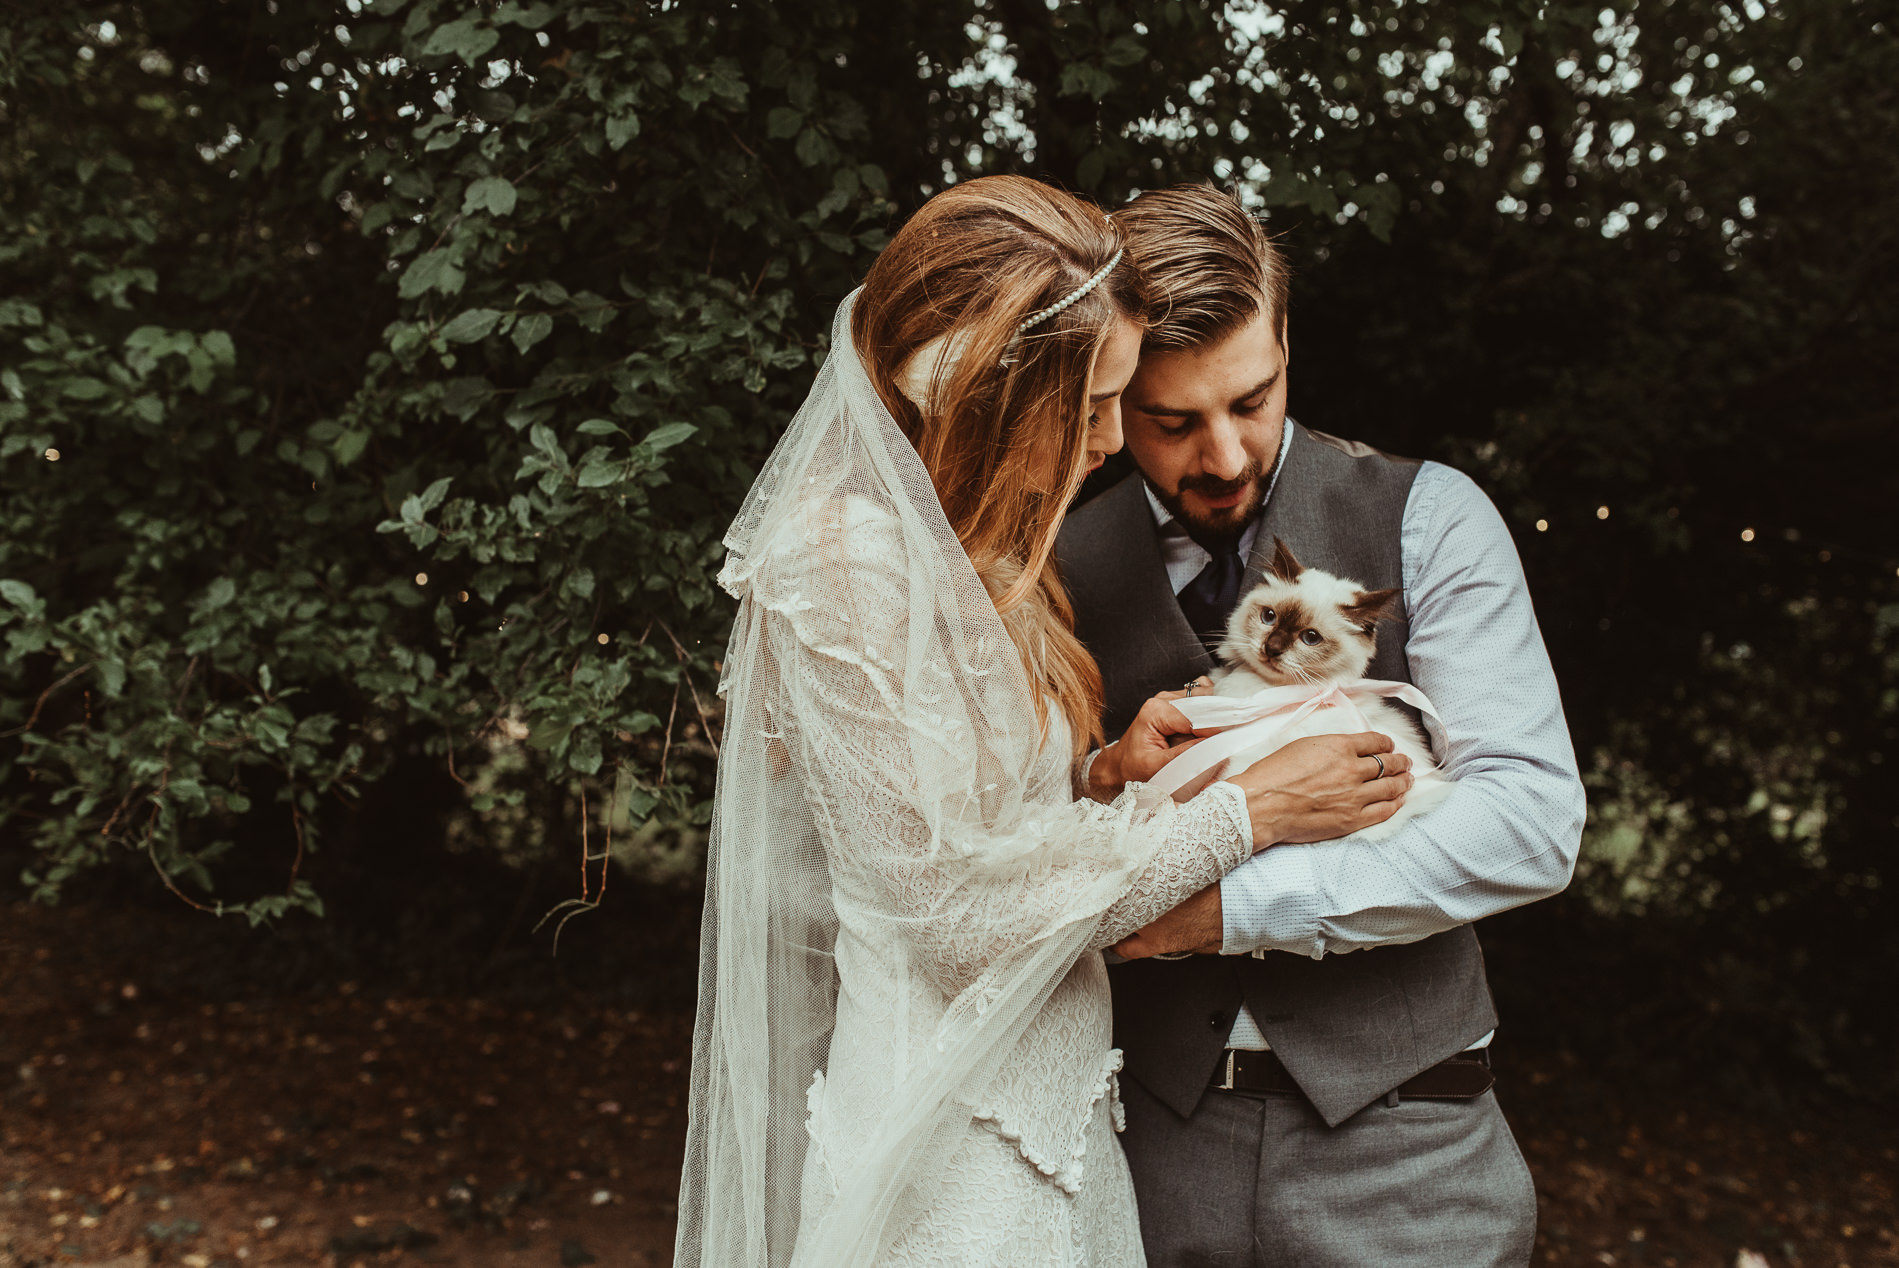 bohemian_wedding_lawshall_church_garden110